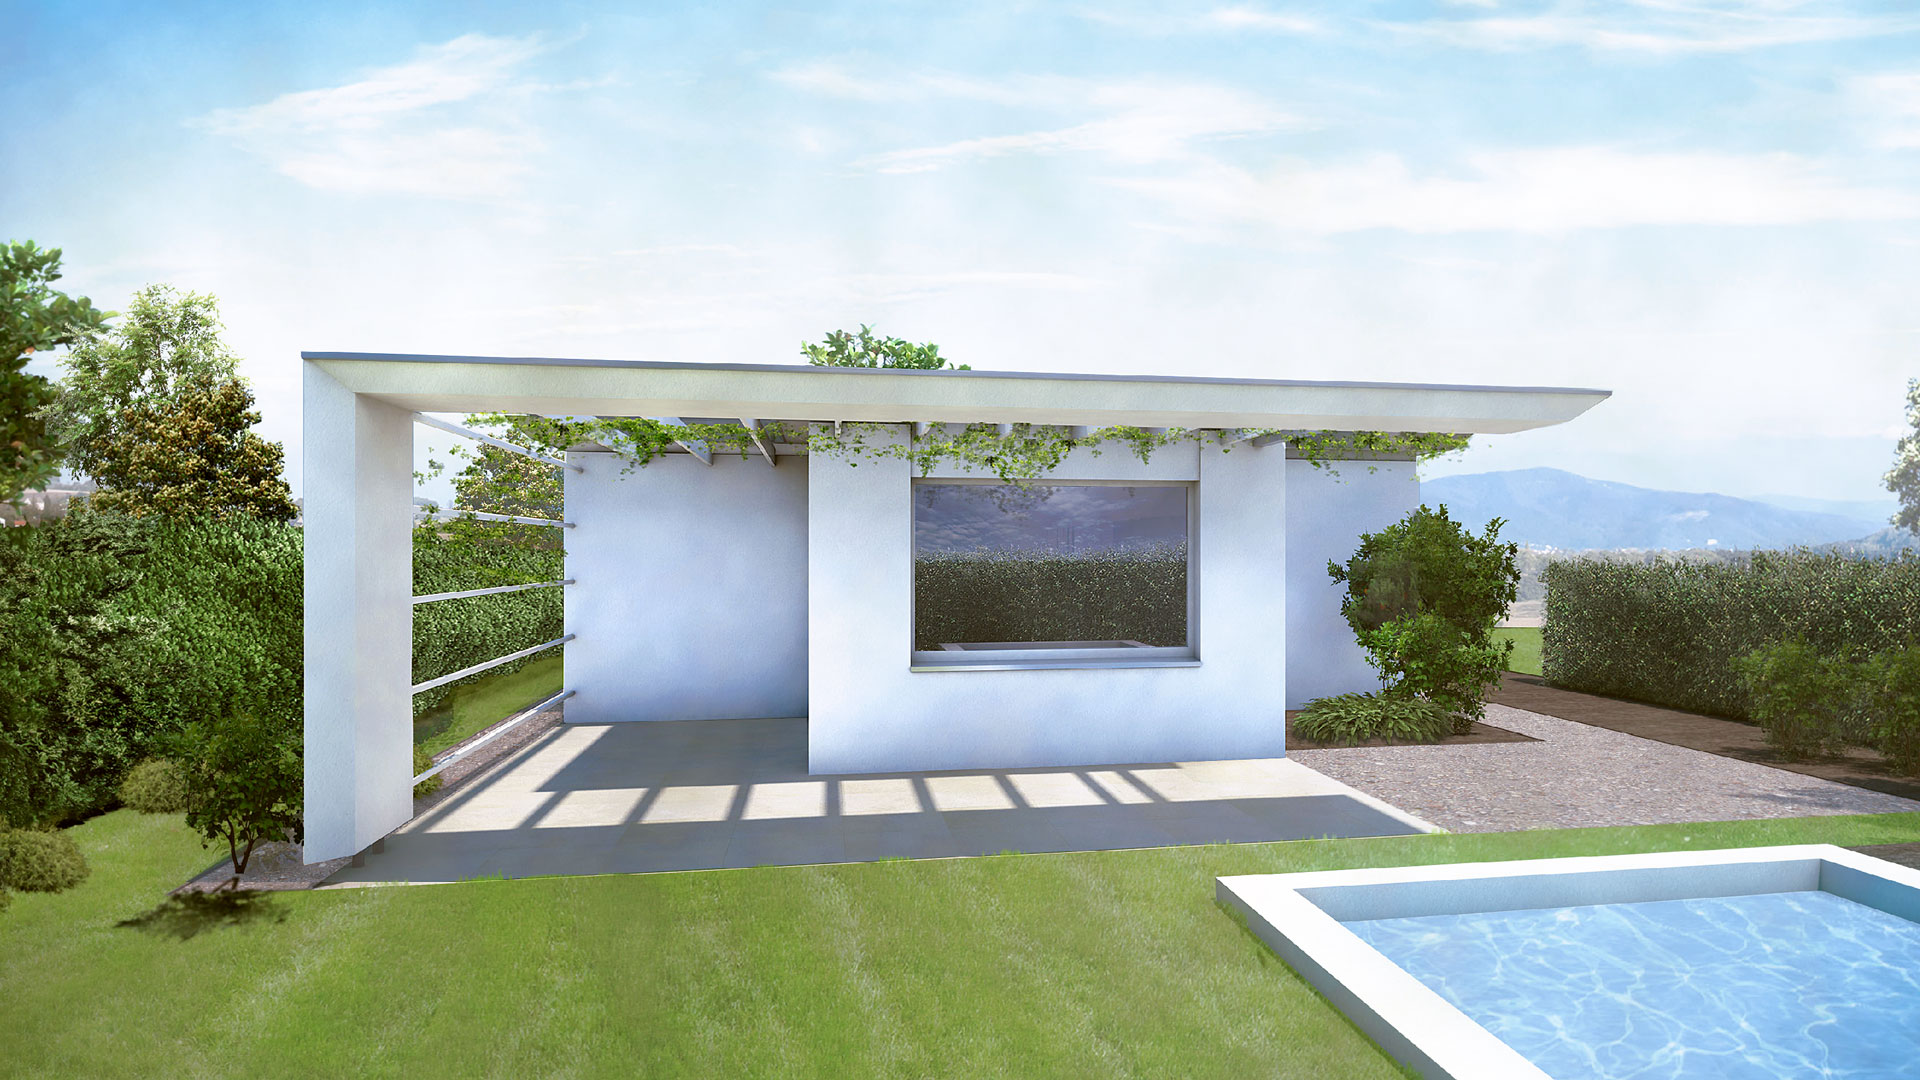 Haus Orthogon Terrasse